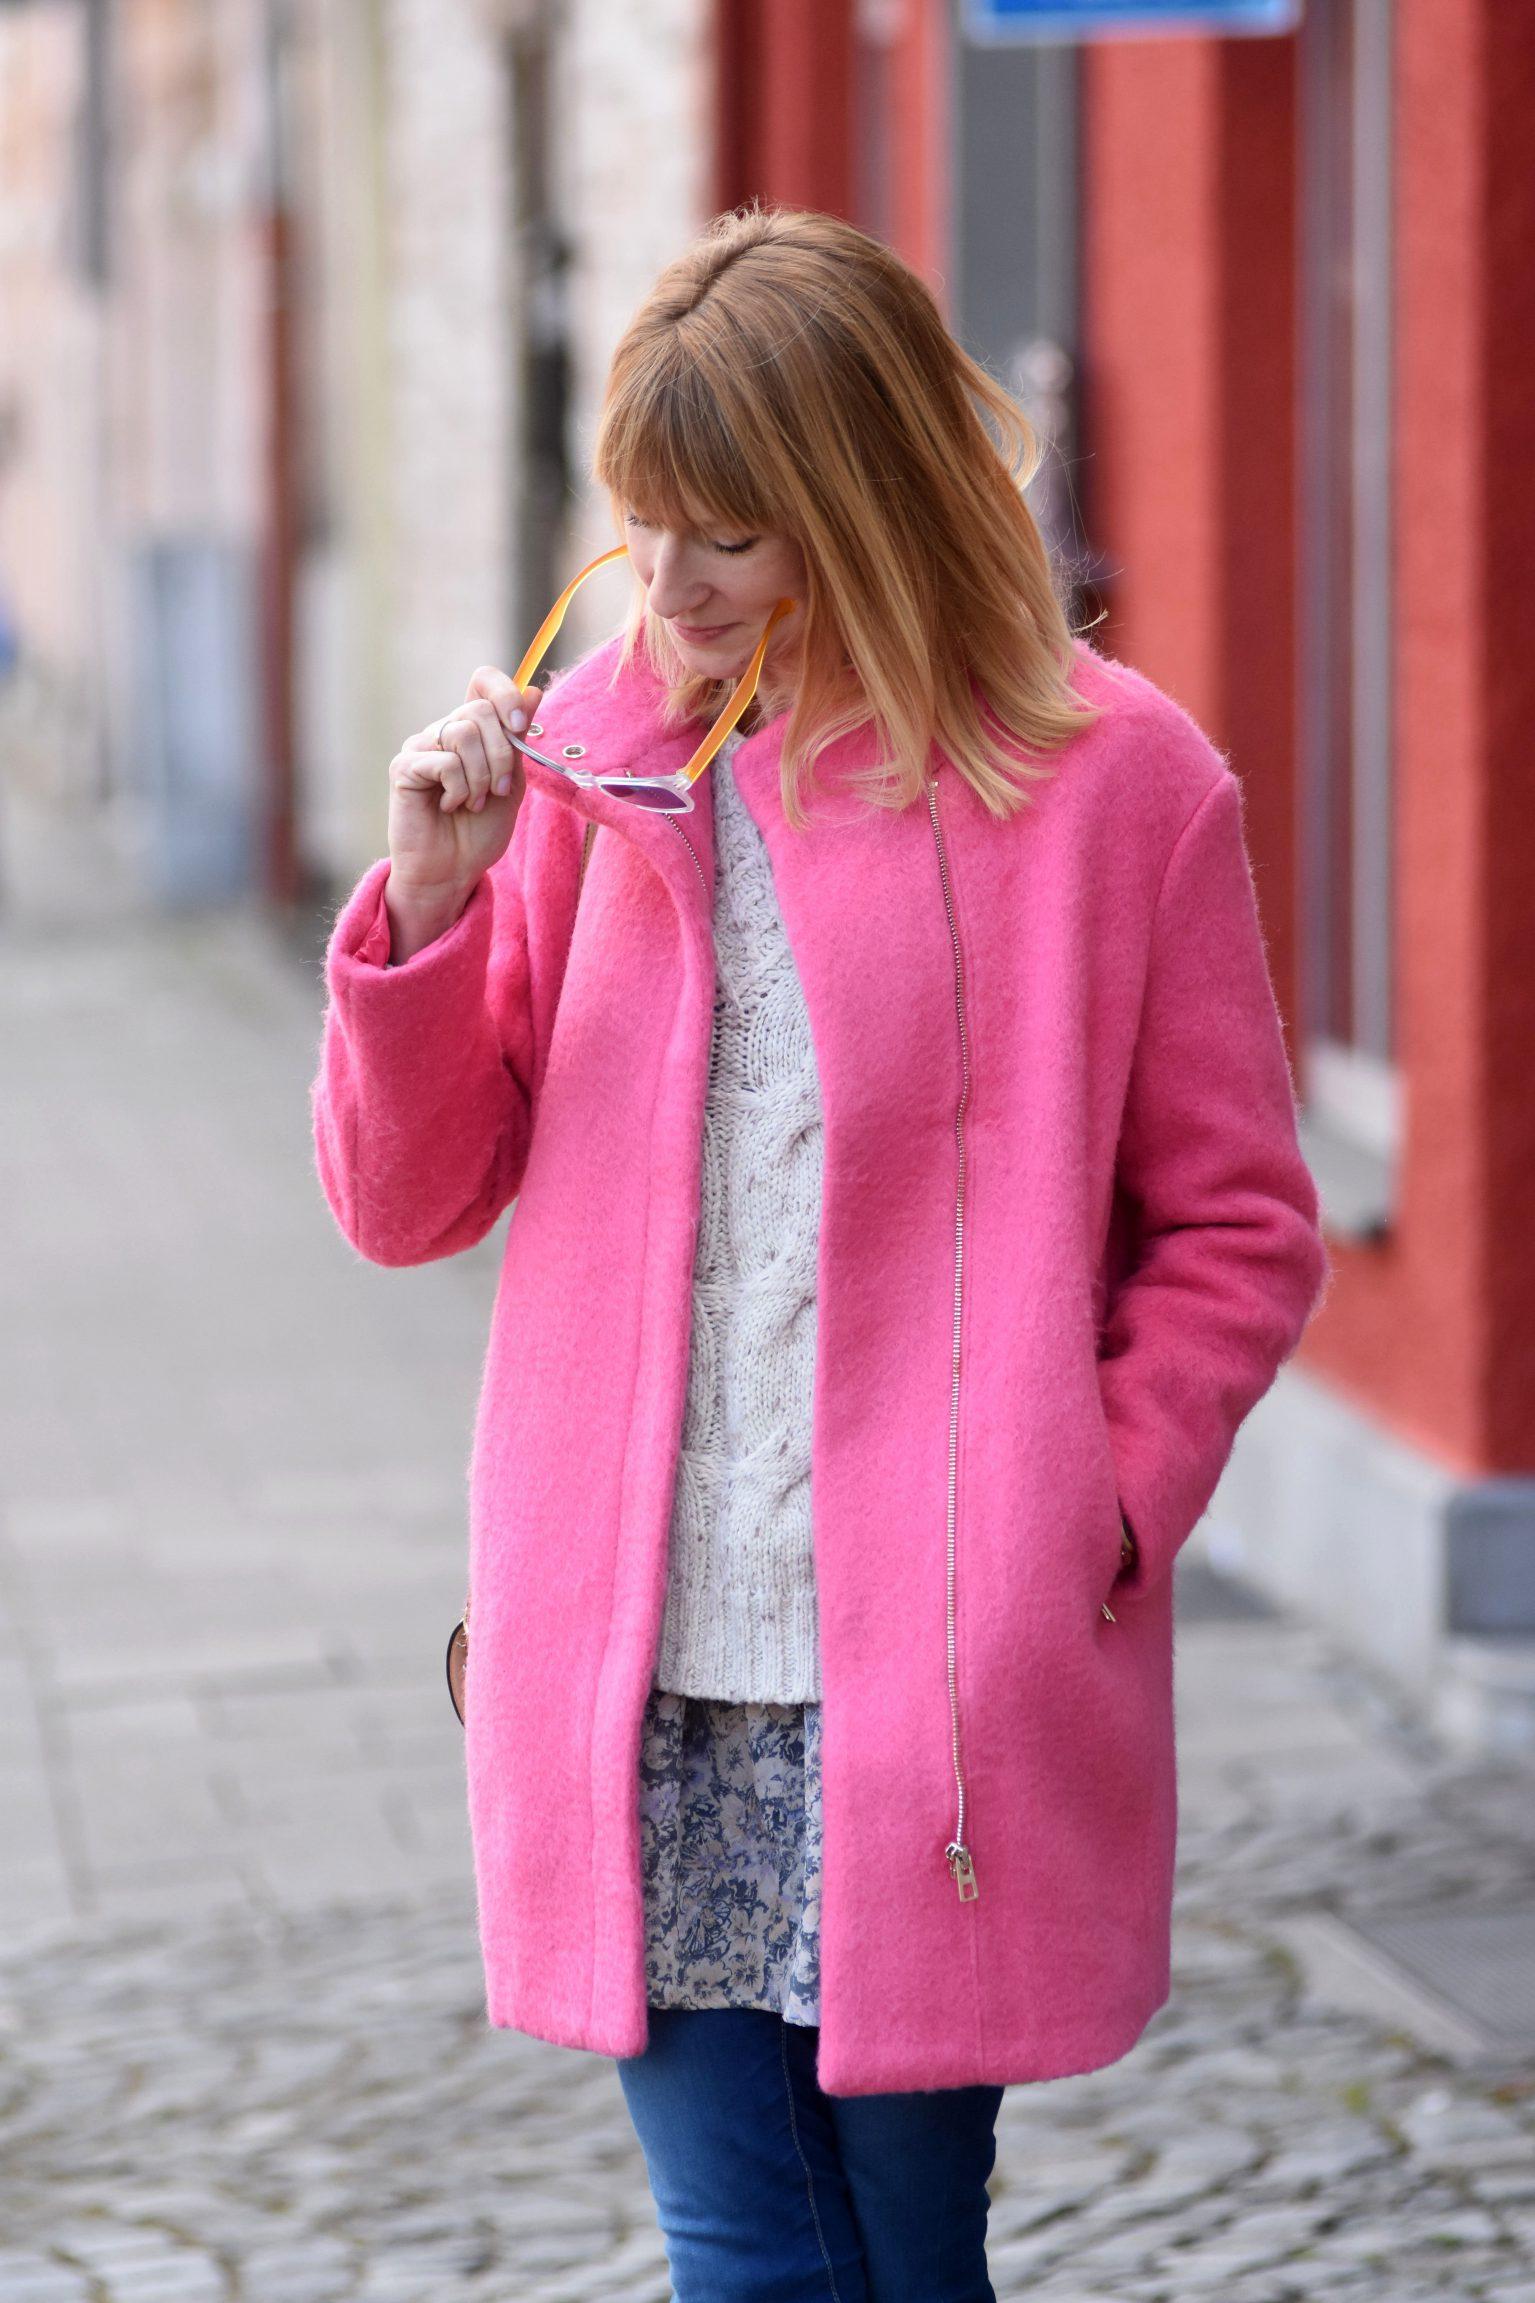 Pink Lady, pinker Mantel, Mamablog, Modemama, Modeblog, Mantel H&M, Lagenlook, Streetstyle, Frühlingslook, Wintermantel,